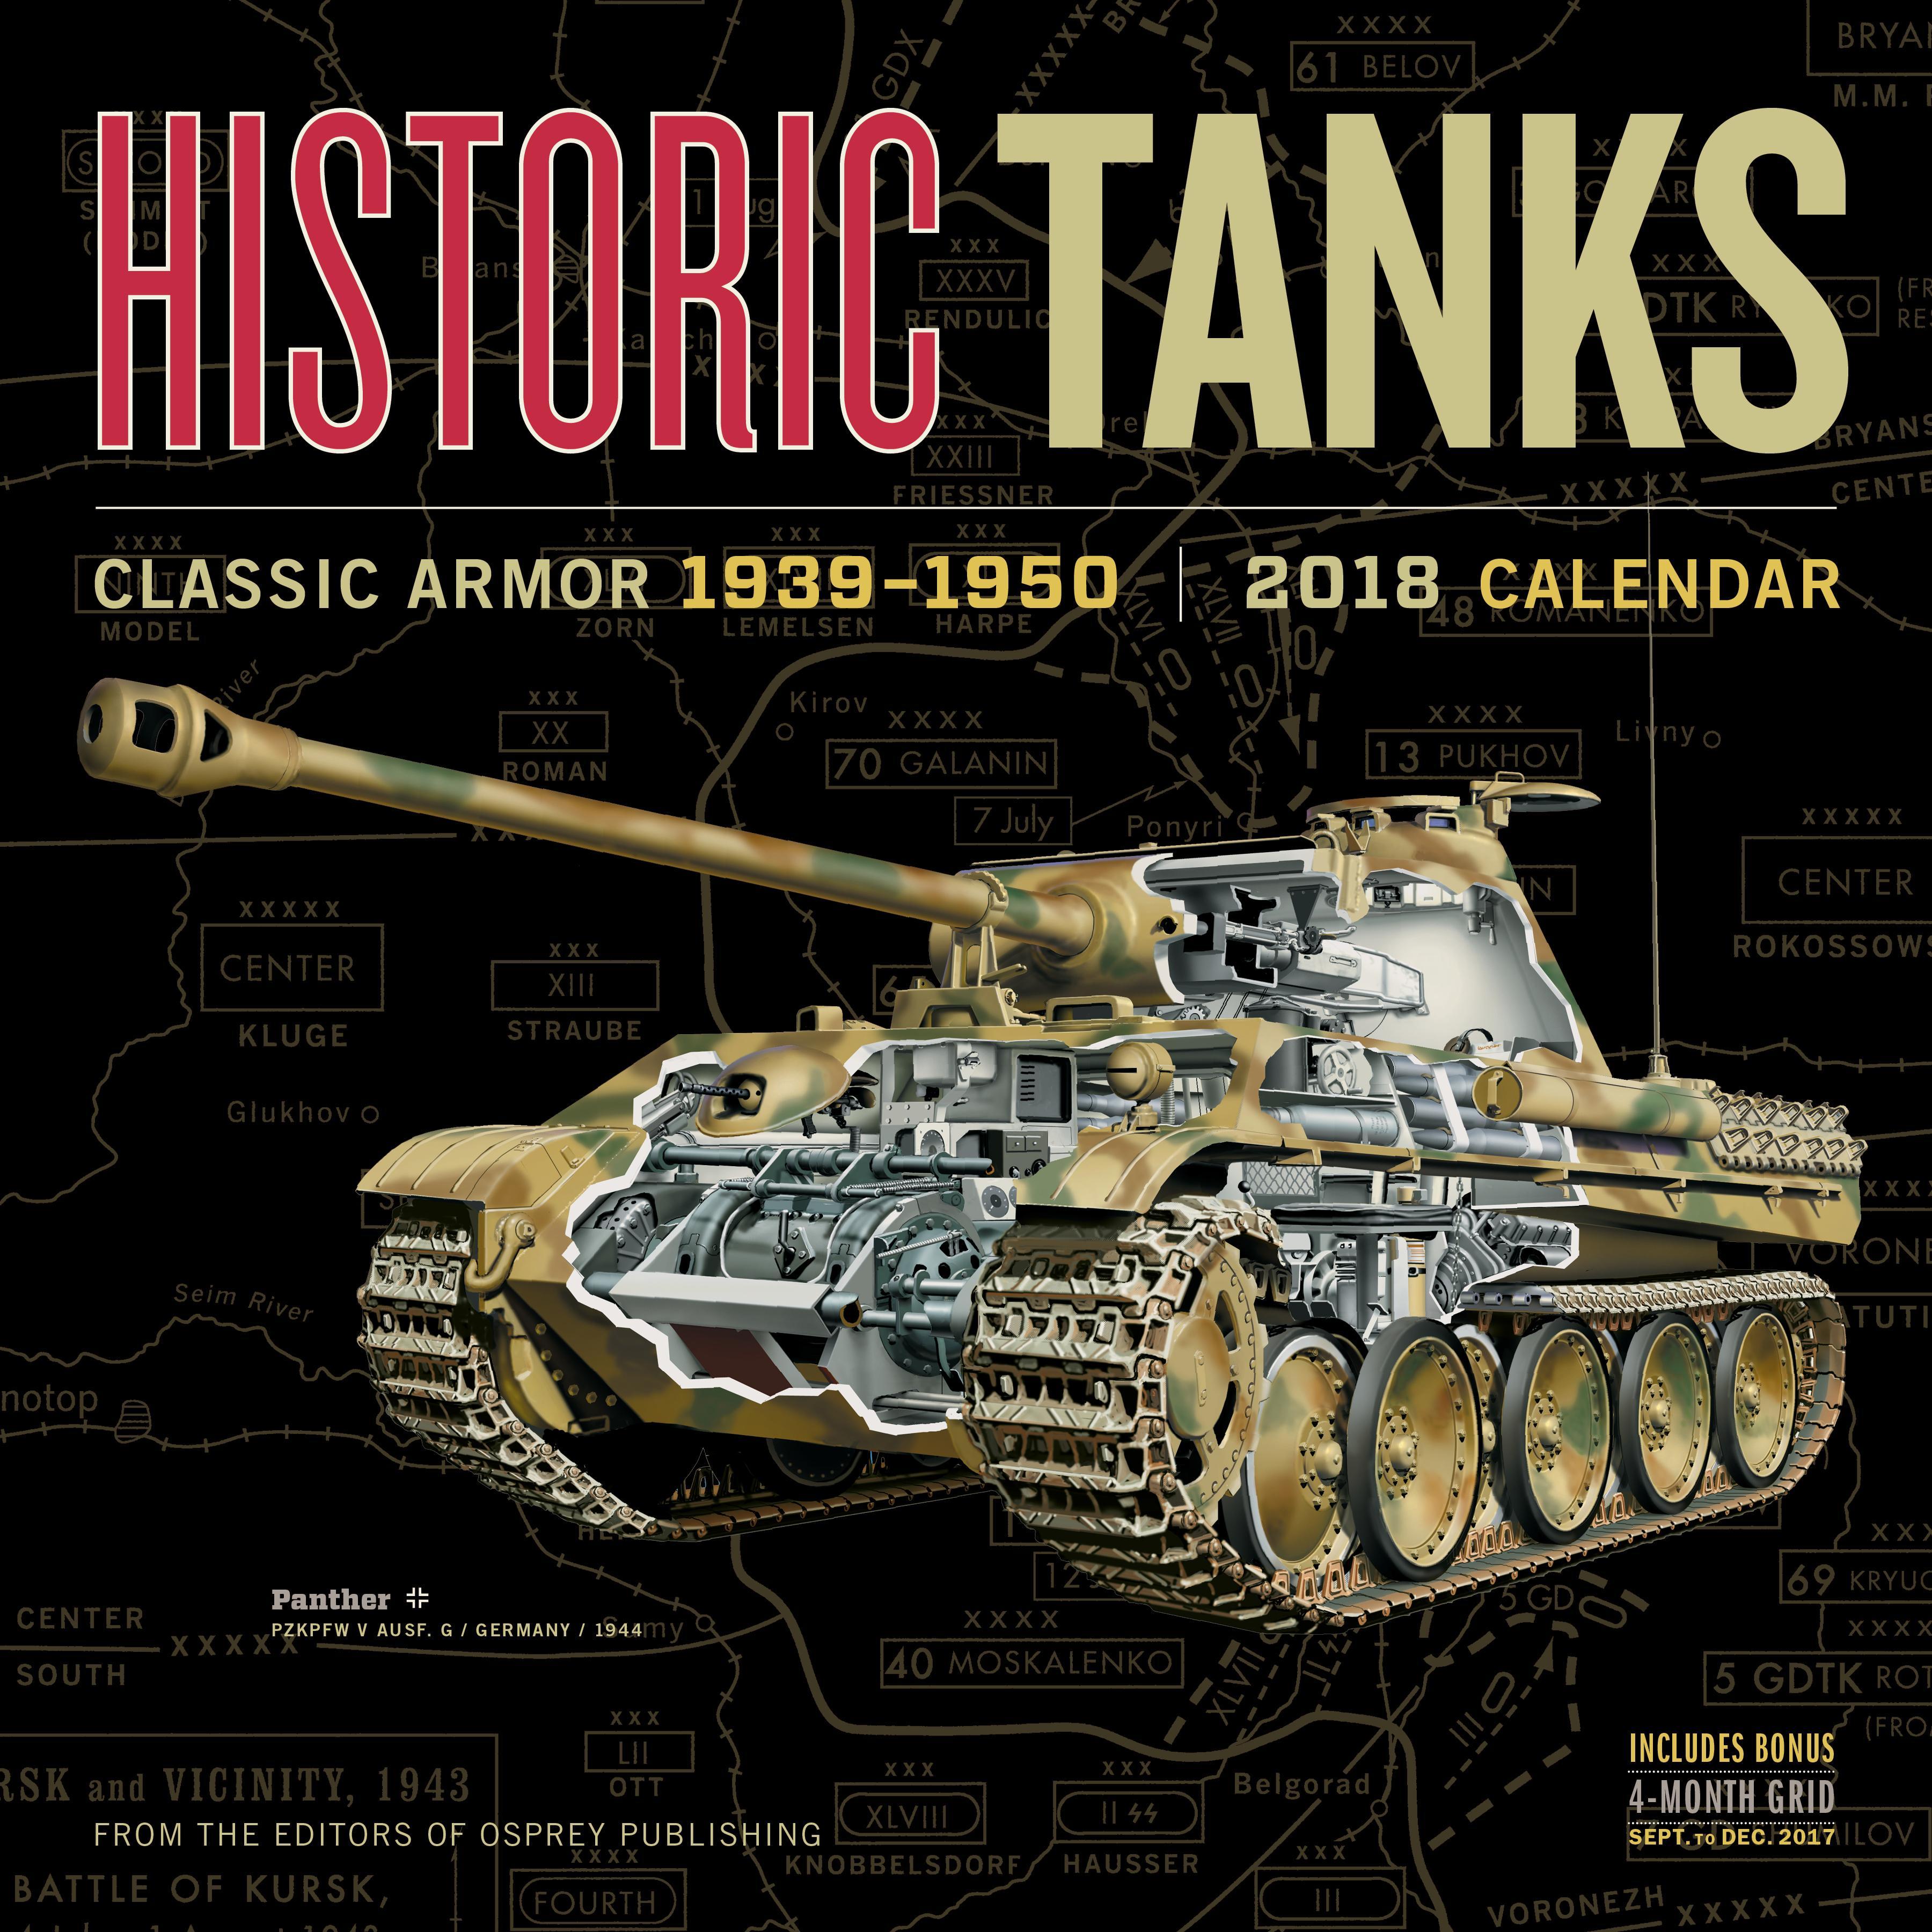 Historic Tanks Wall Calendar 2018 Editors of Osprey Publishing